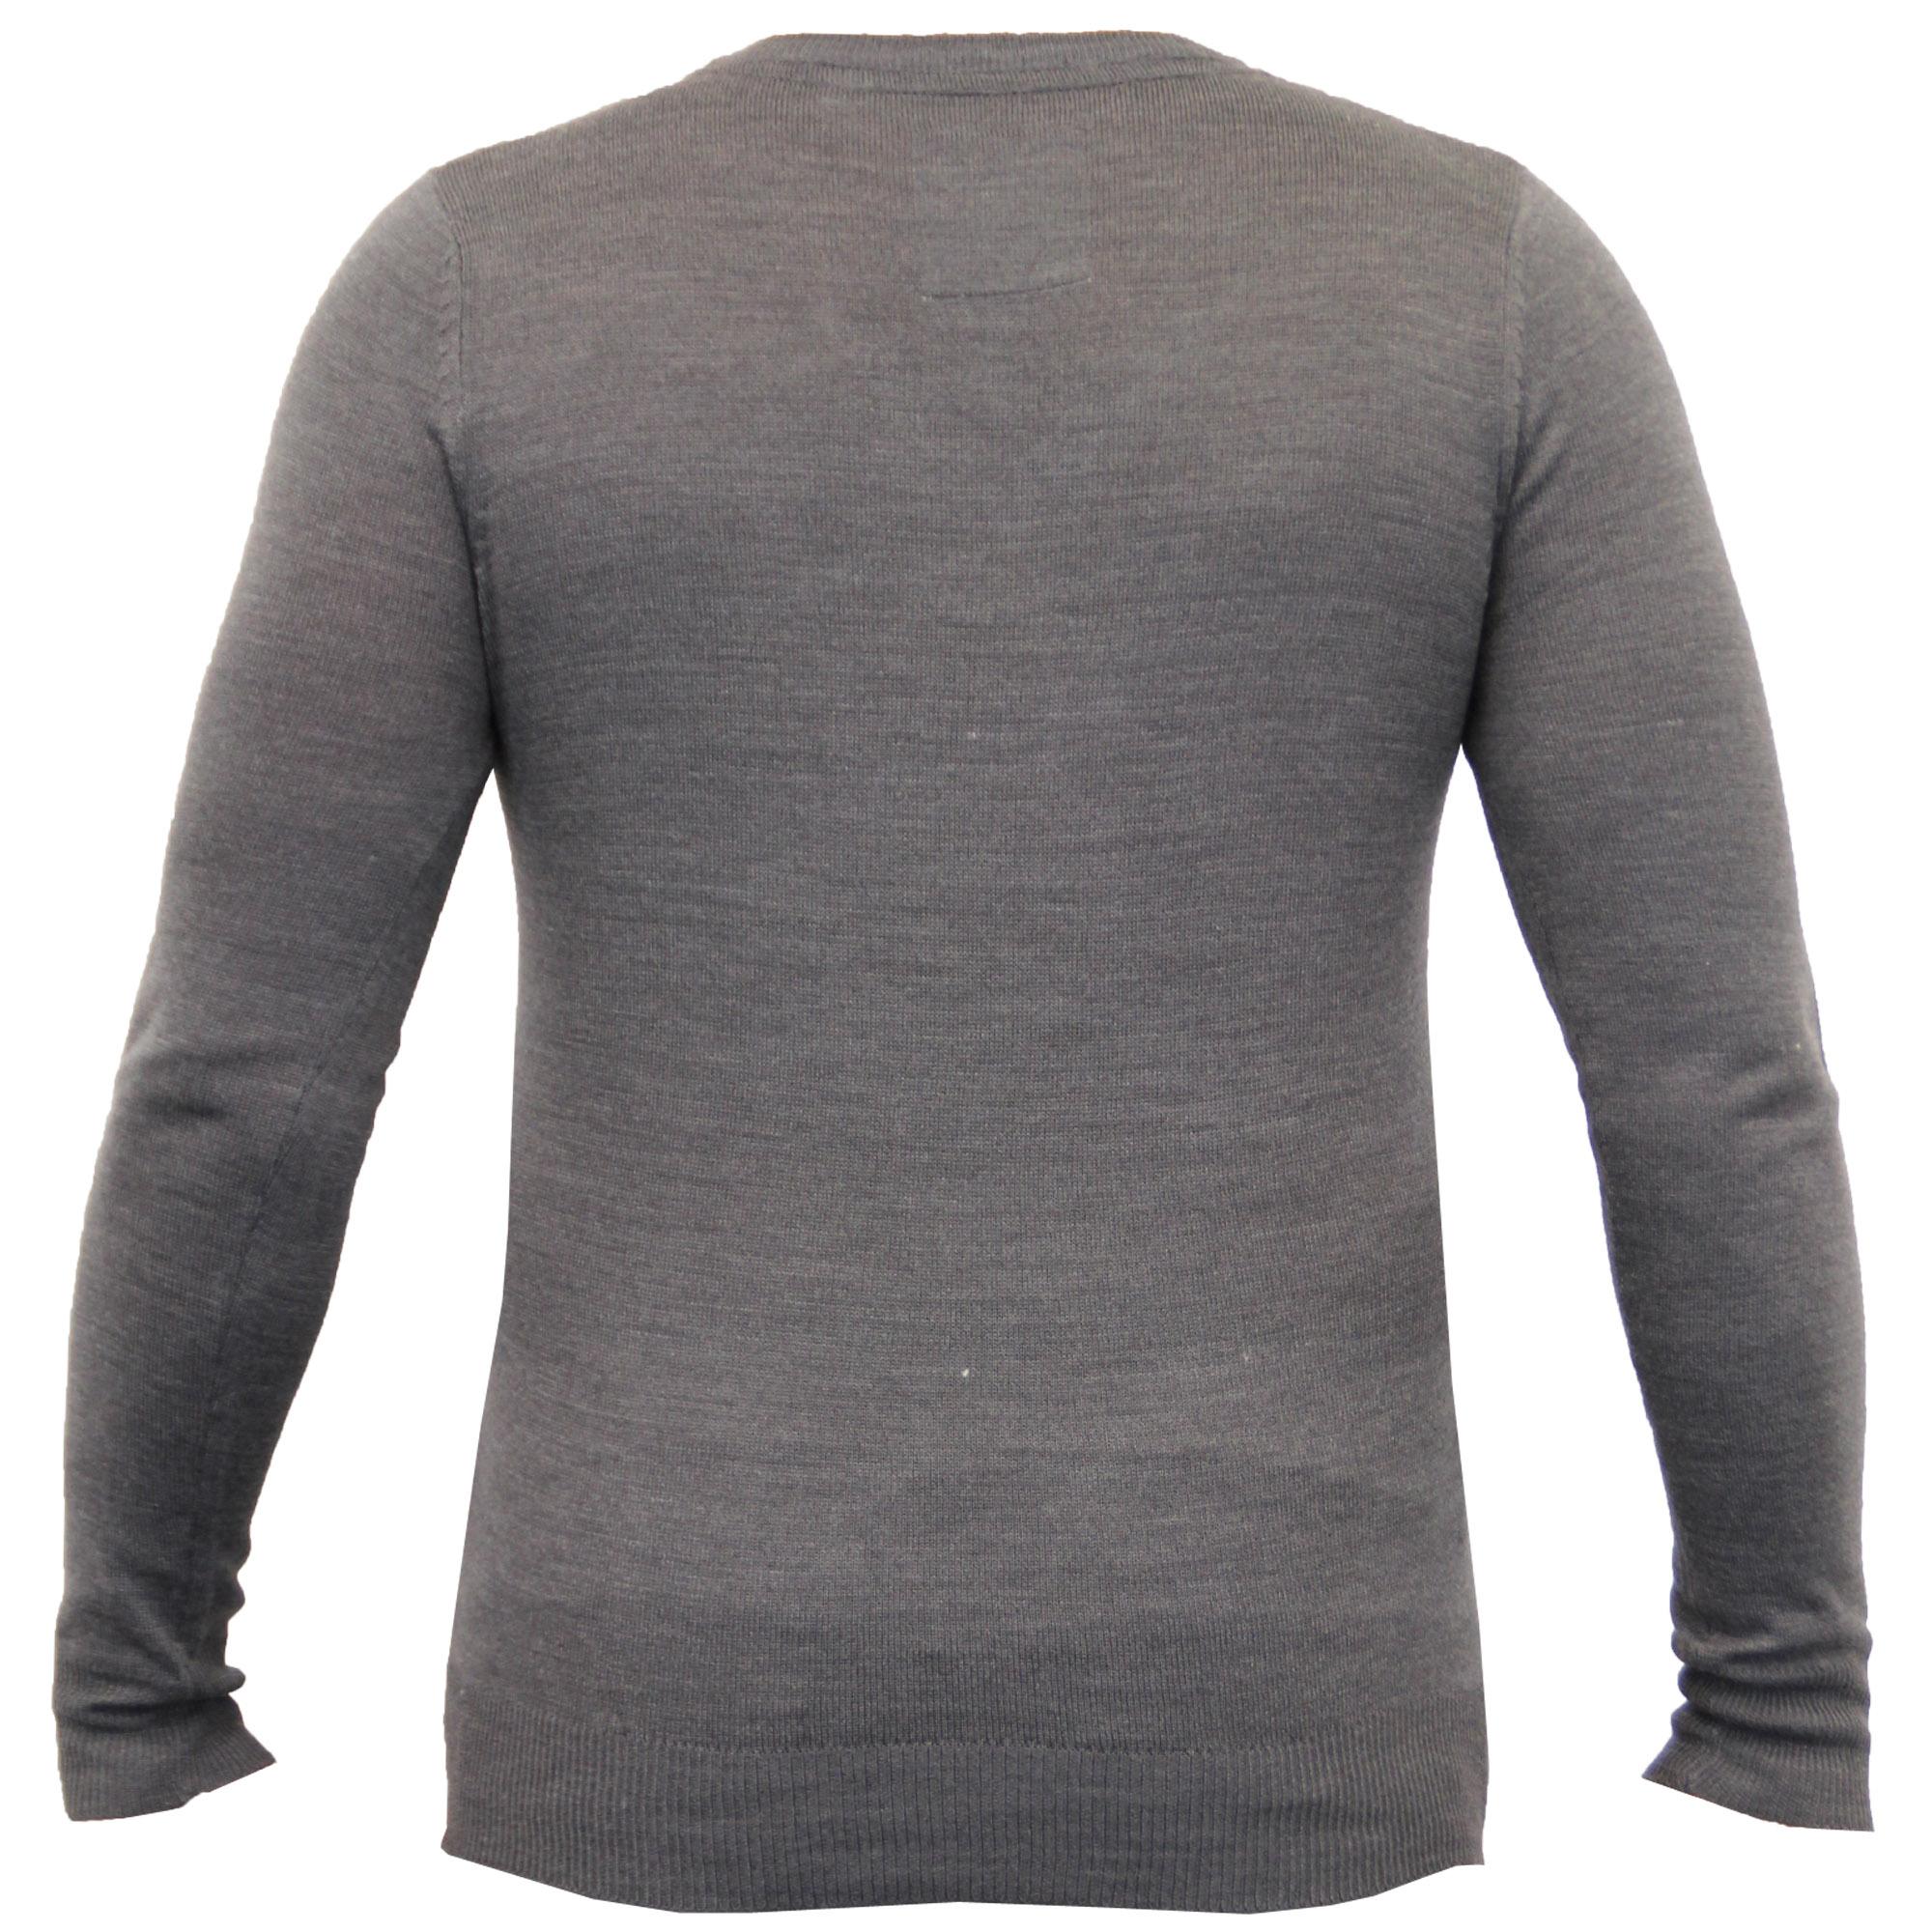 Mens-Jumper-Soul-Star-Knitted-Sweater-Pullover-Crew-V-Neck-Lightweight-Winter thumbnail 6